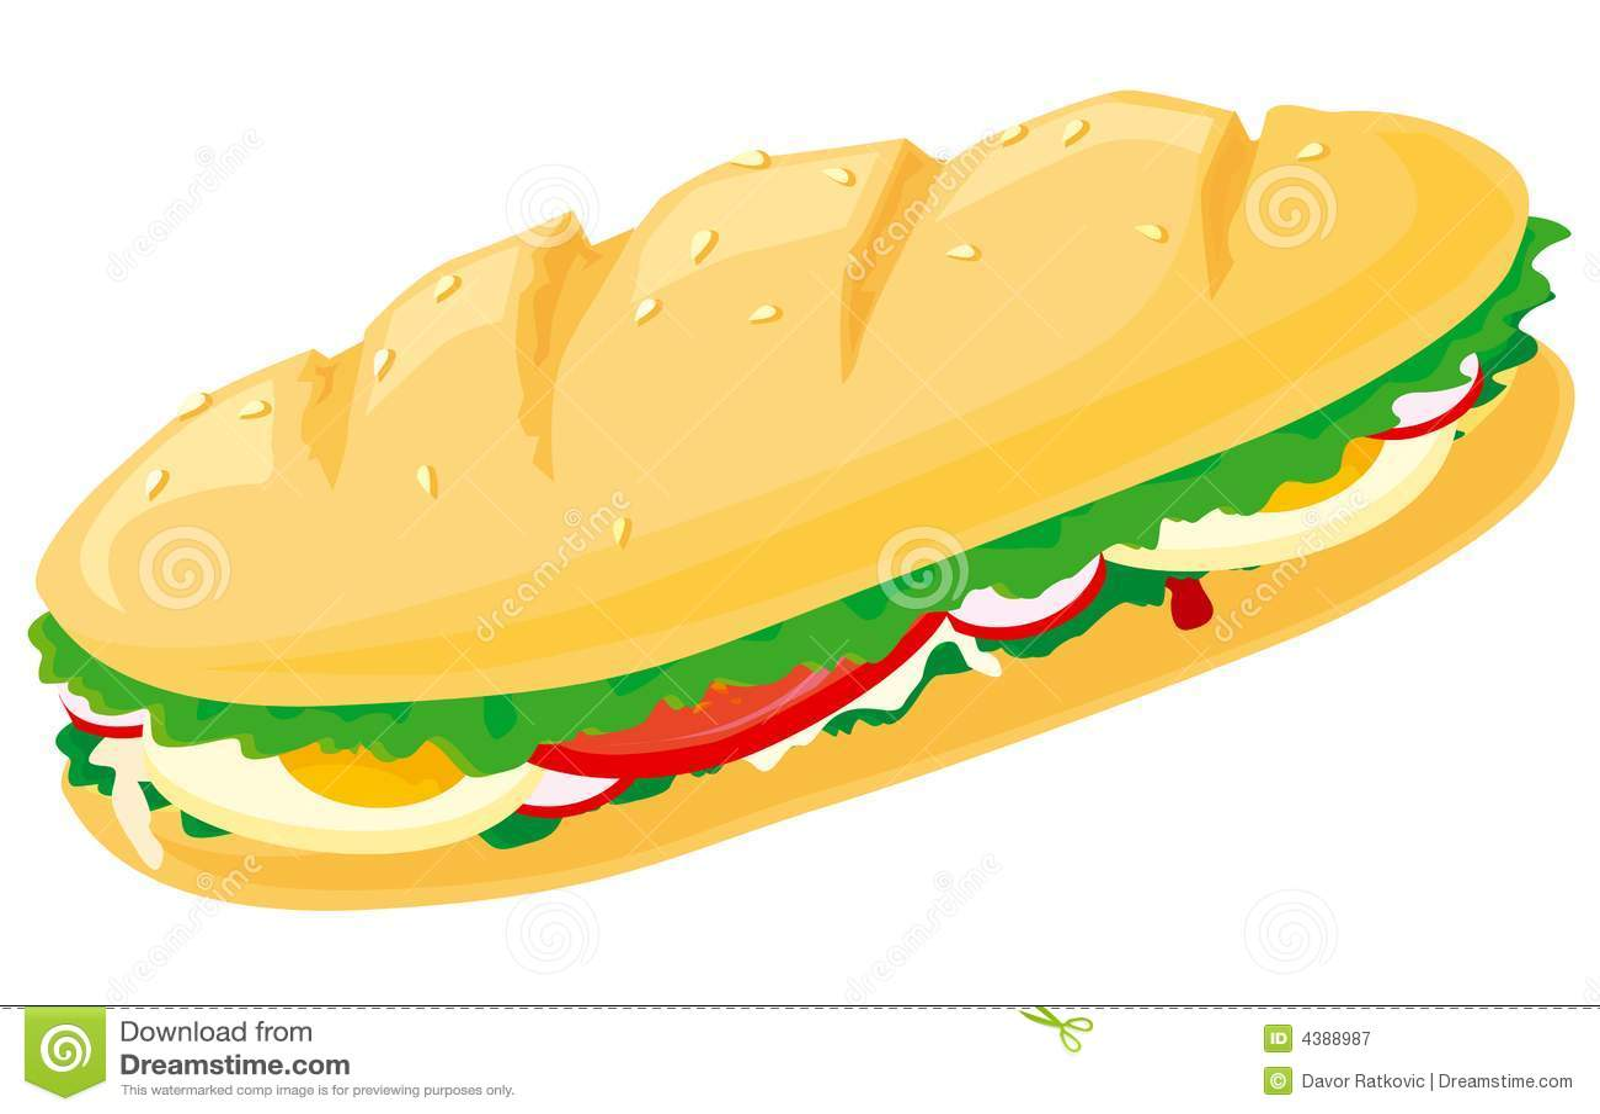 Sandwich Stock Vector Image Of Vegetable Black Tomato